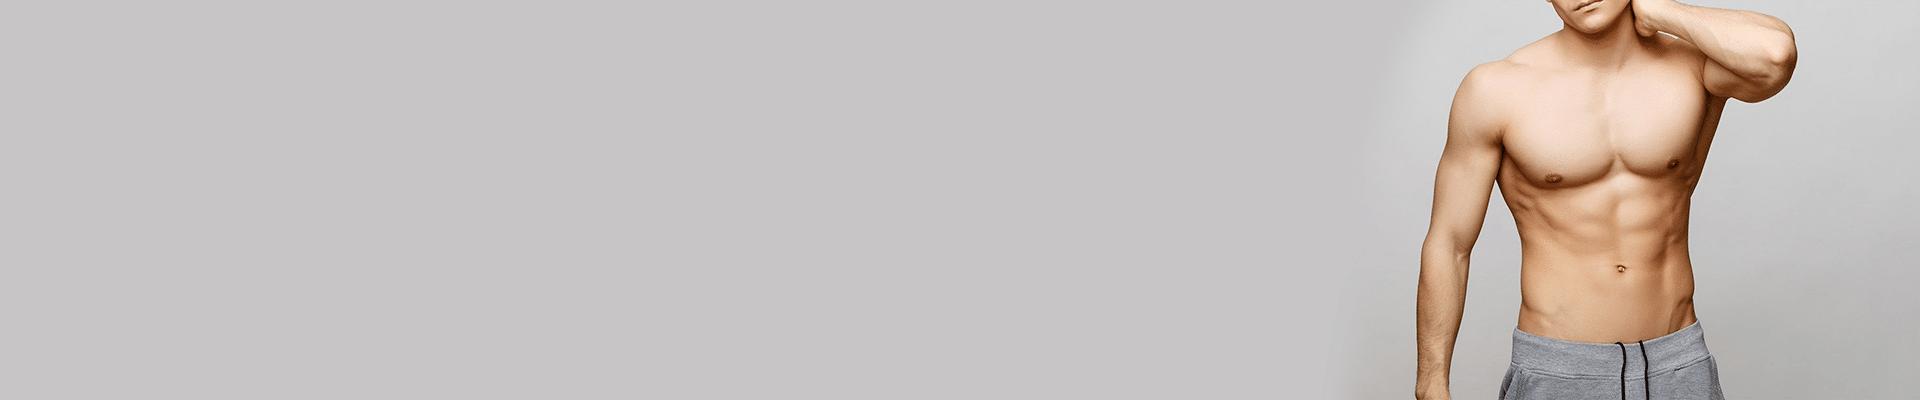 [:fr]Implants pectoraux Nabeul : Implant prothèse pectoral homme prix Nabeul[:ar]زراعة الصدر في نابل : زراعة صدر للرجال سعر نابل[:]